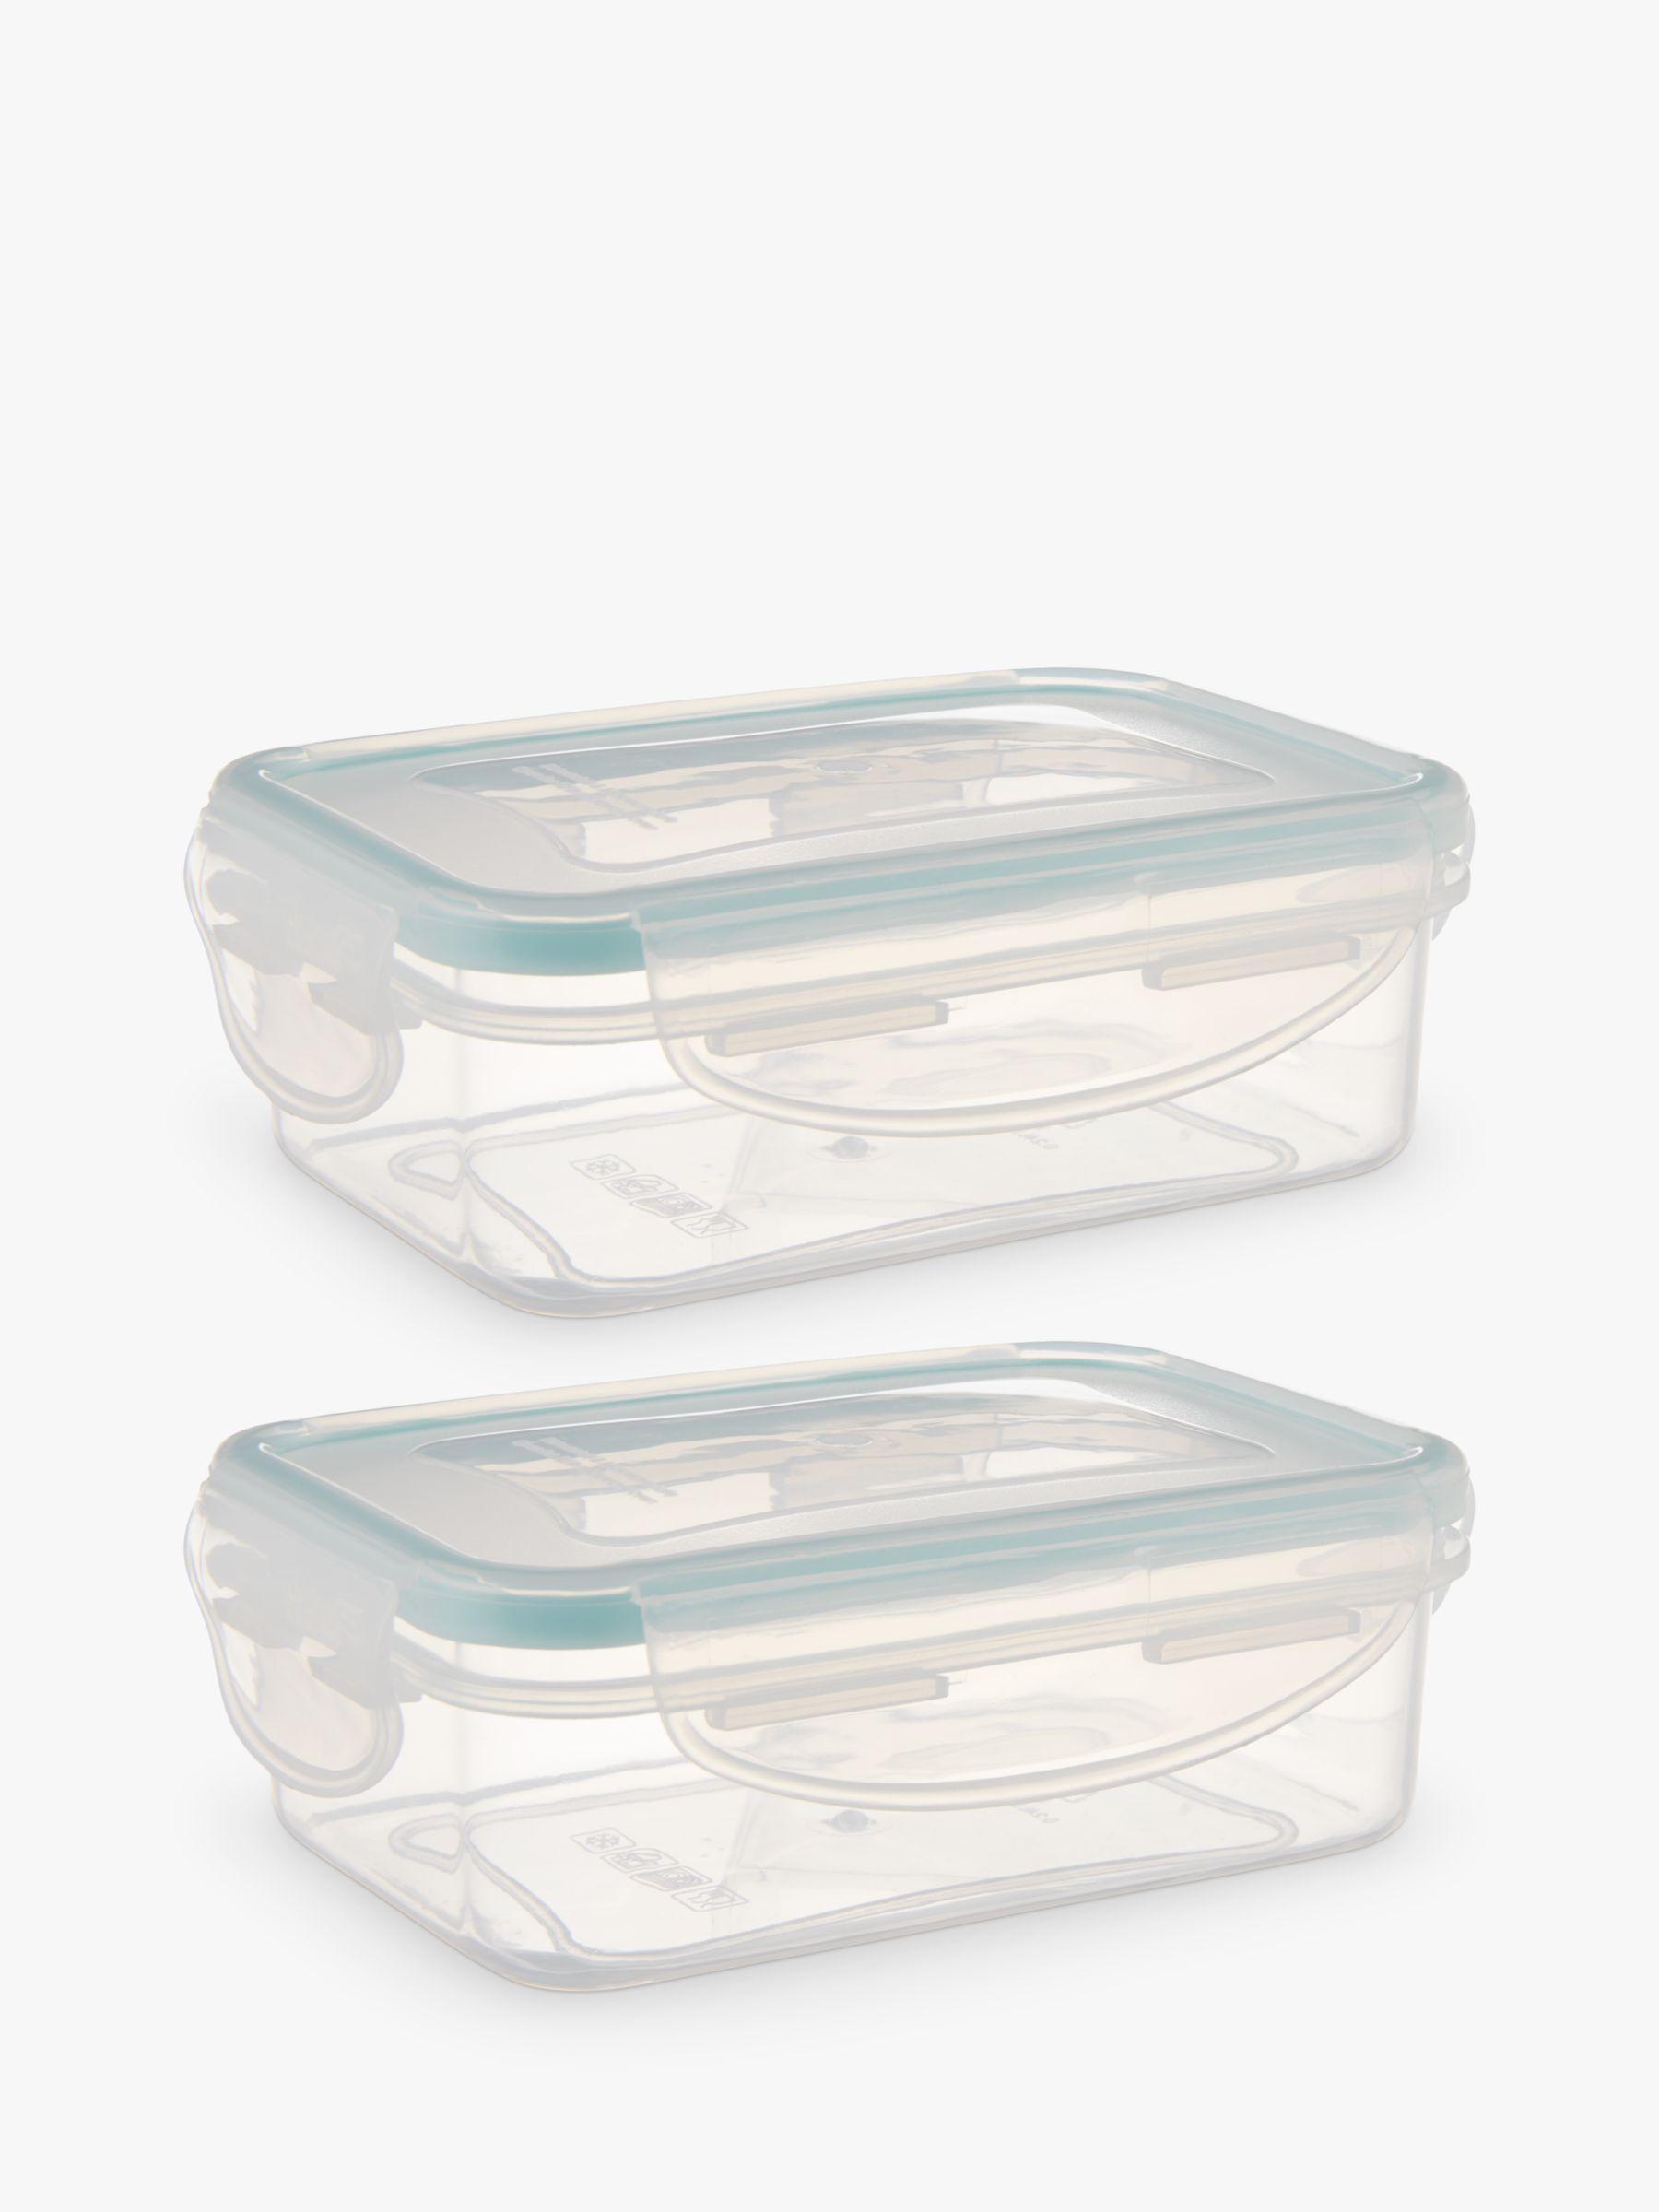 John Lewis Polypropylene Snack Pot Storage Containers Set of 2